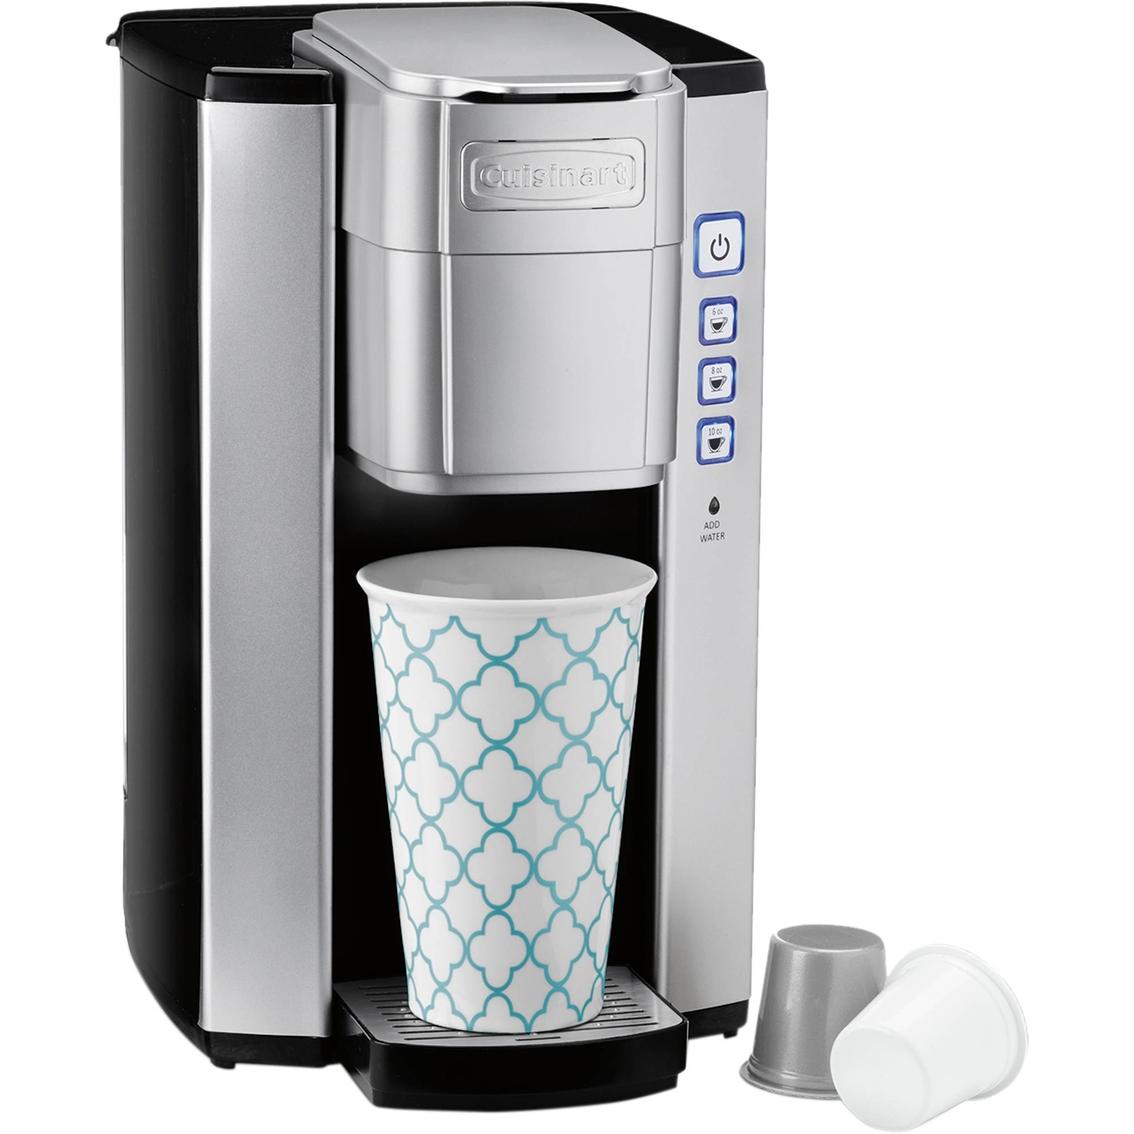 Cuisinart Compact Single Serve Coffeemaker